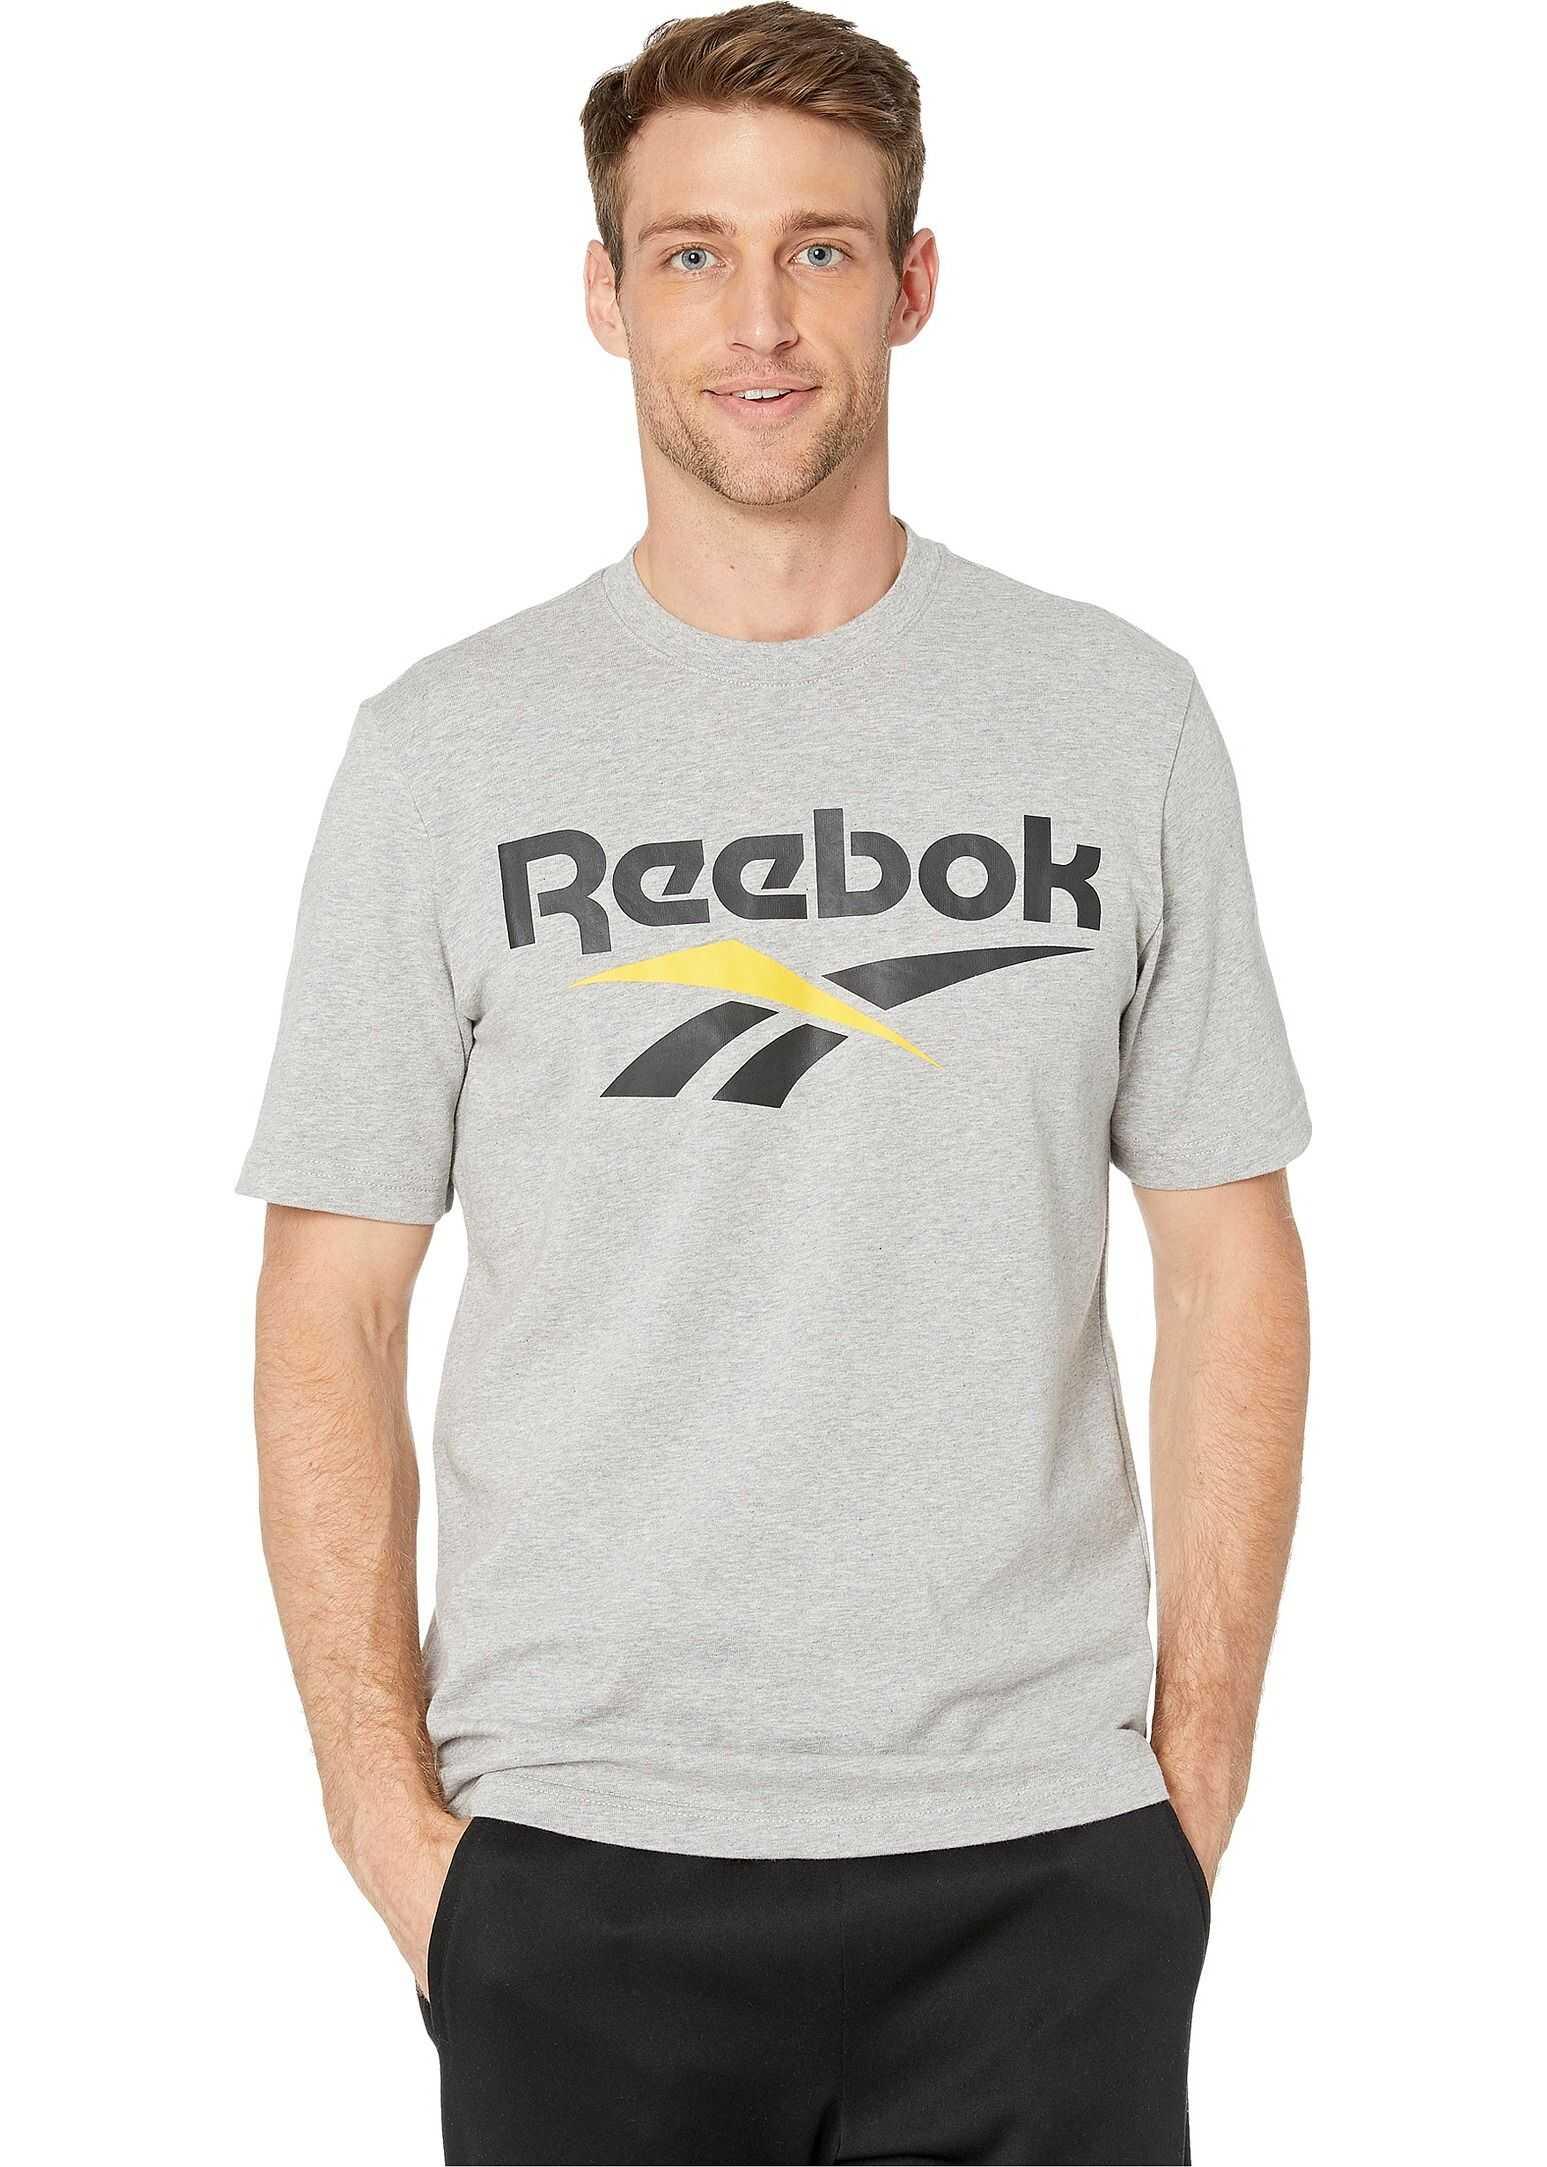 Reebok Classics Vector Tee Medium Grey Heather/Black